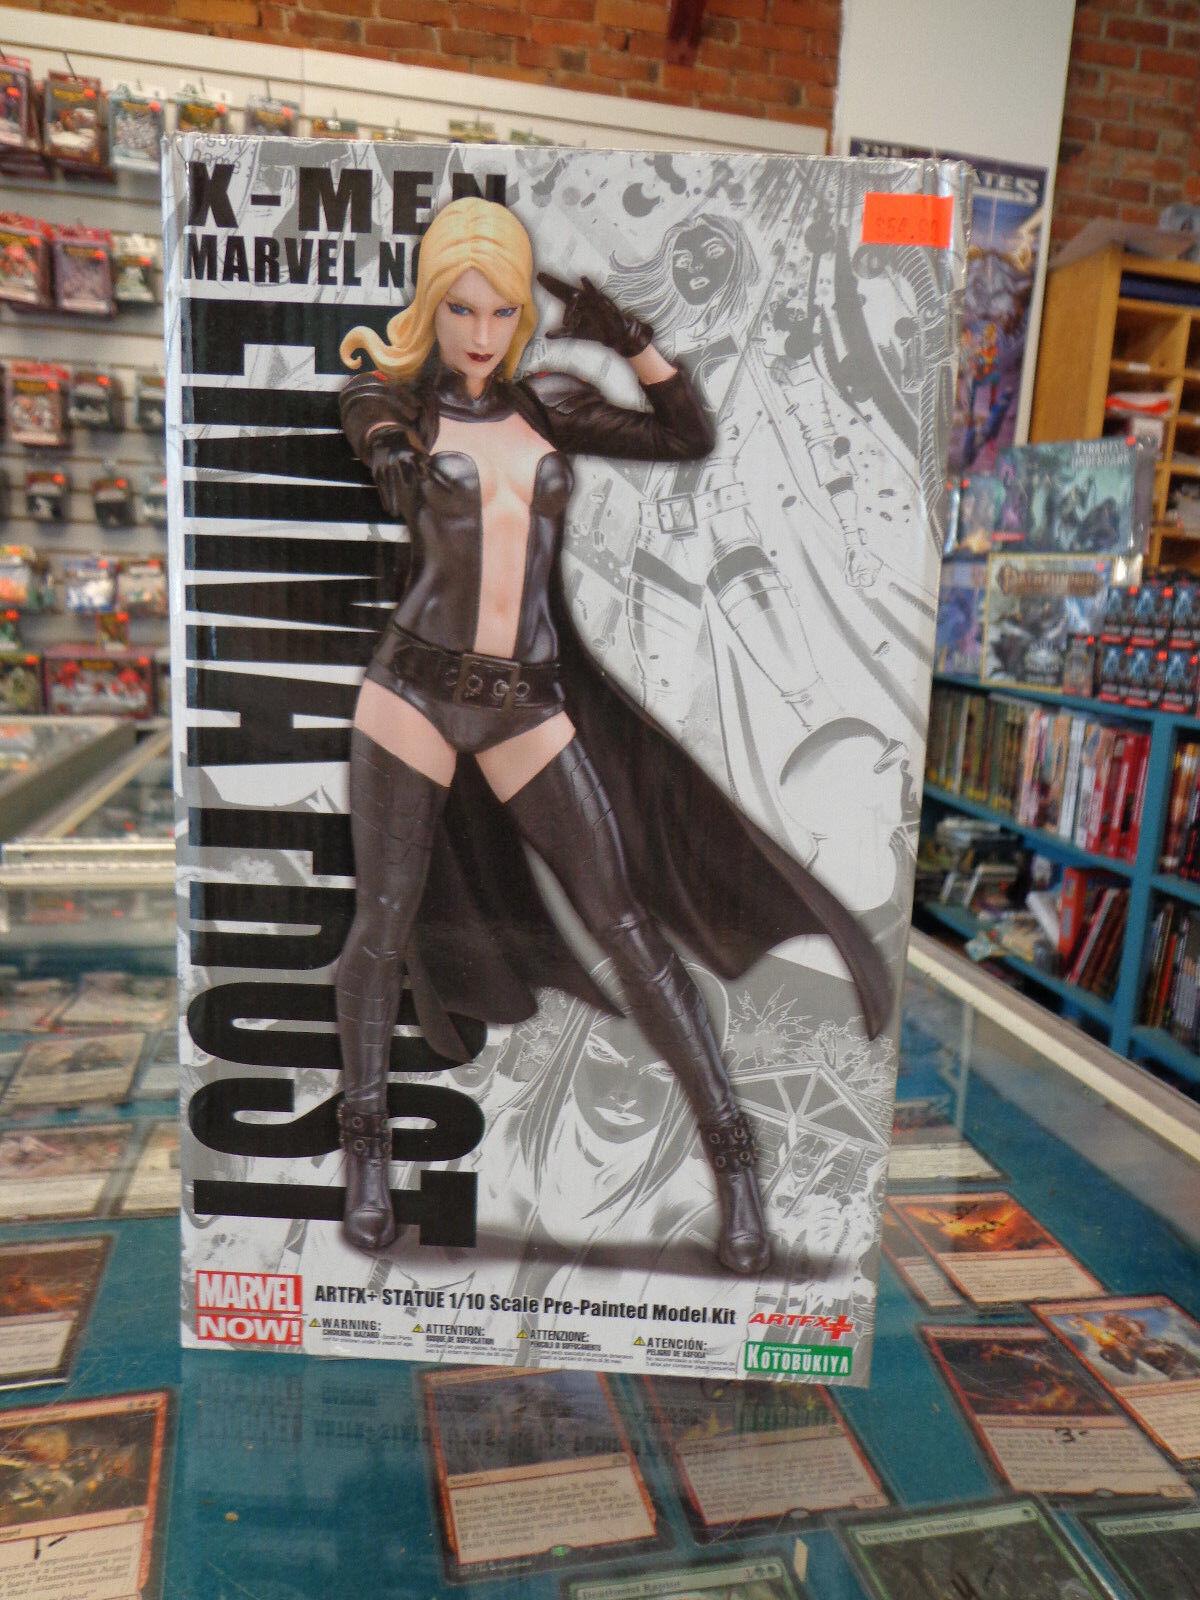 Kotobukiya artfx marvel - comics  x - men  emma frost marvel jetzt statue